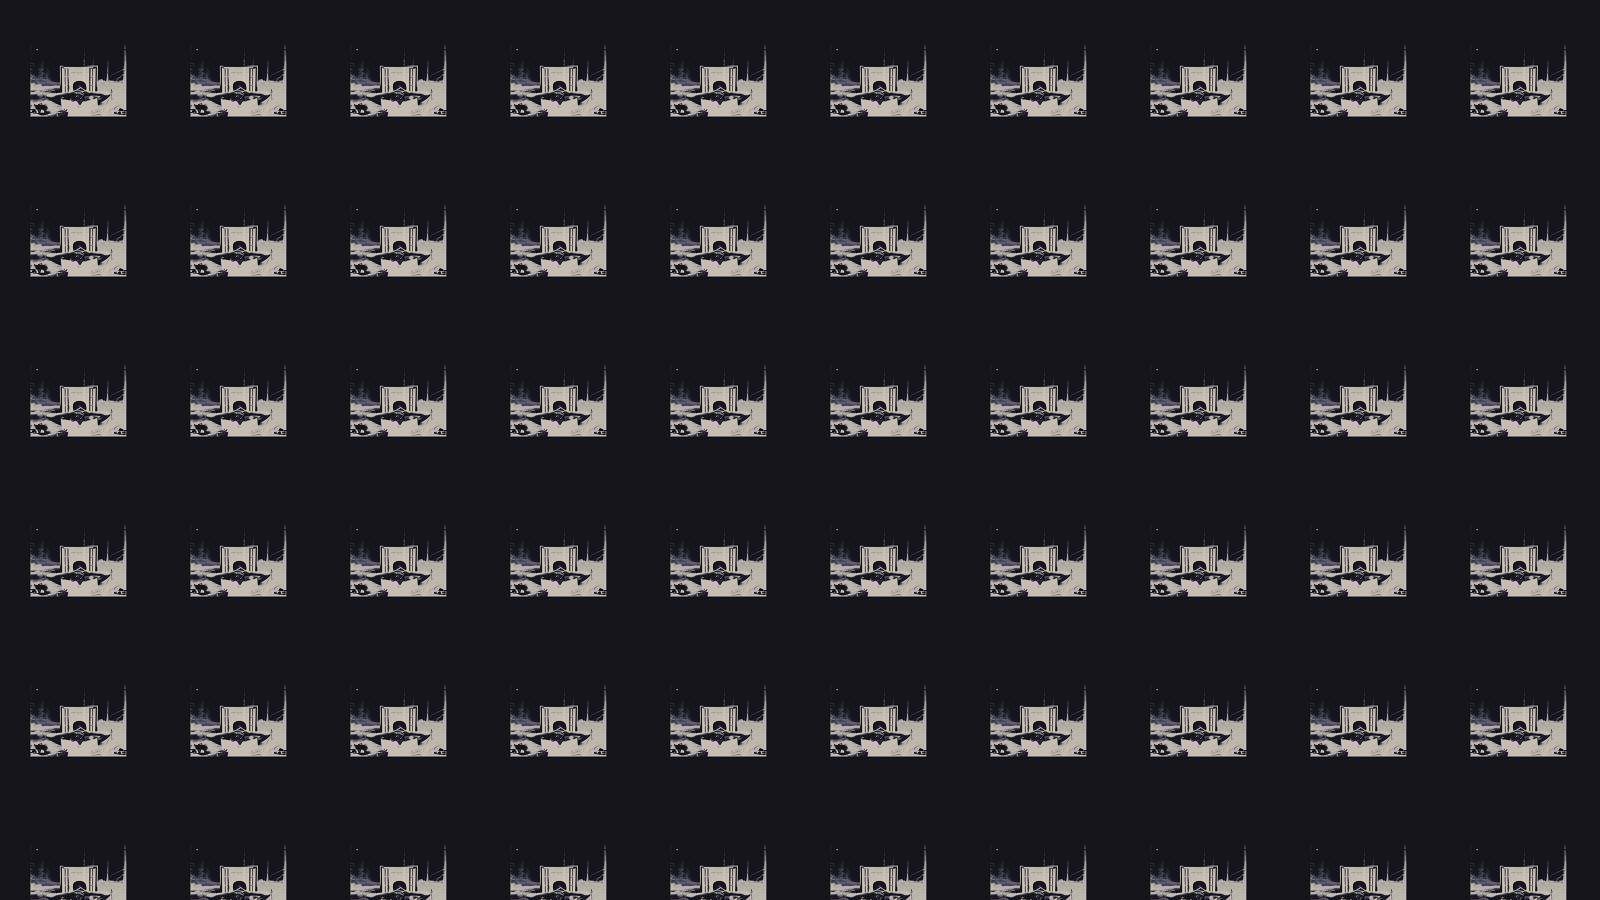 Earl Sweatshirt I Dont Like Shit Wallpaper Tiled Desktop